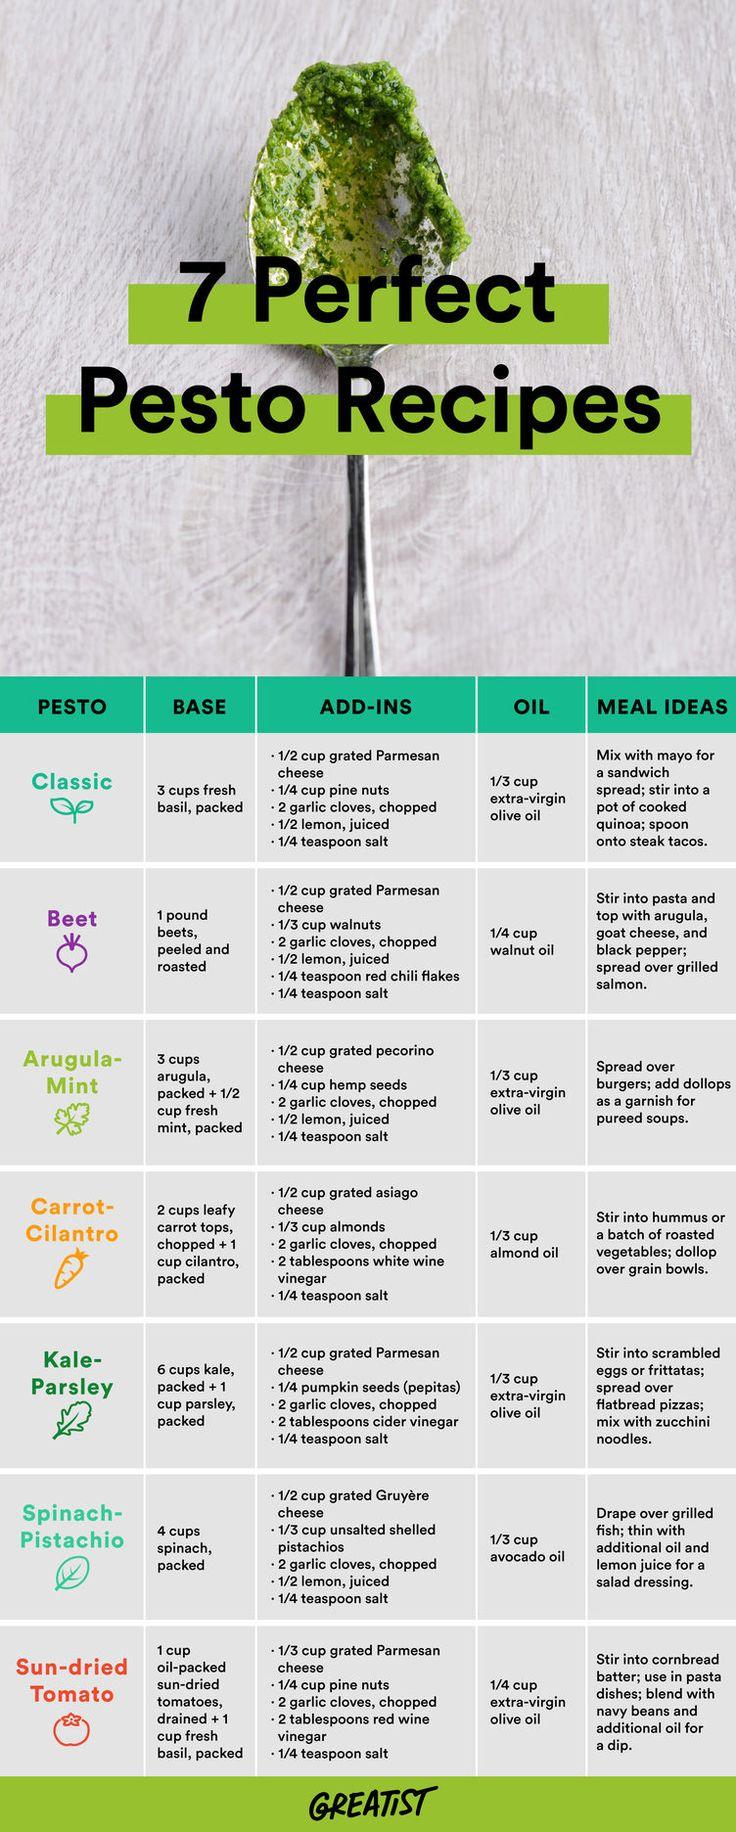 How to Make Pesto: 7 Healthy Pesto Recipes | Greatist